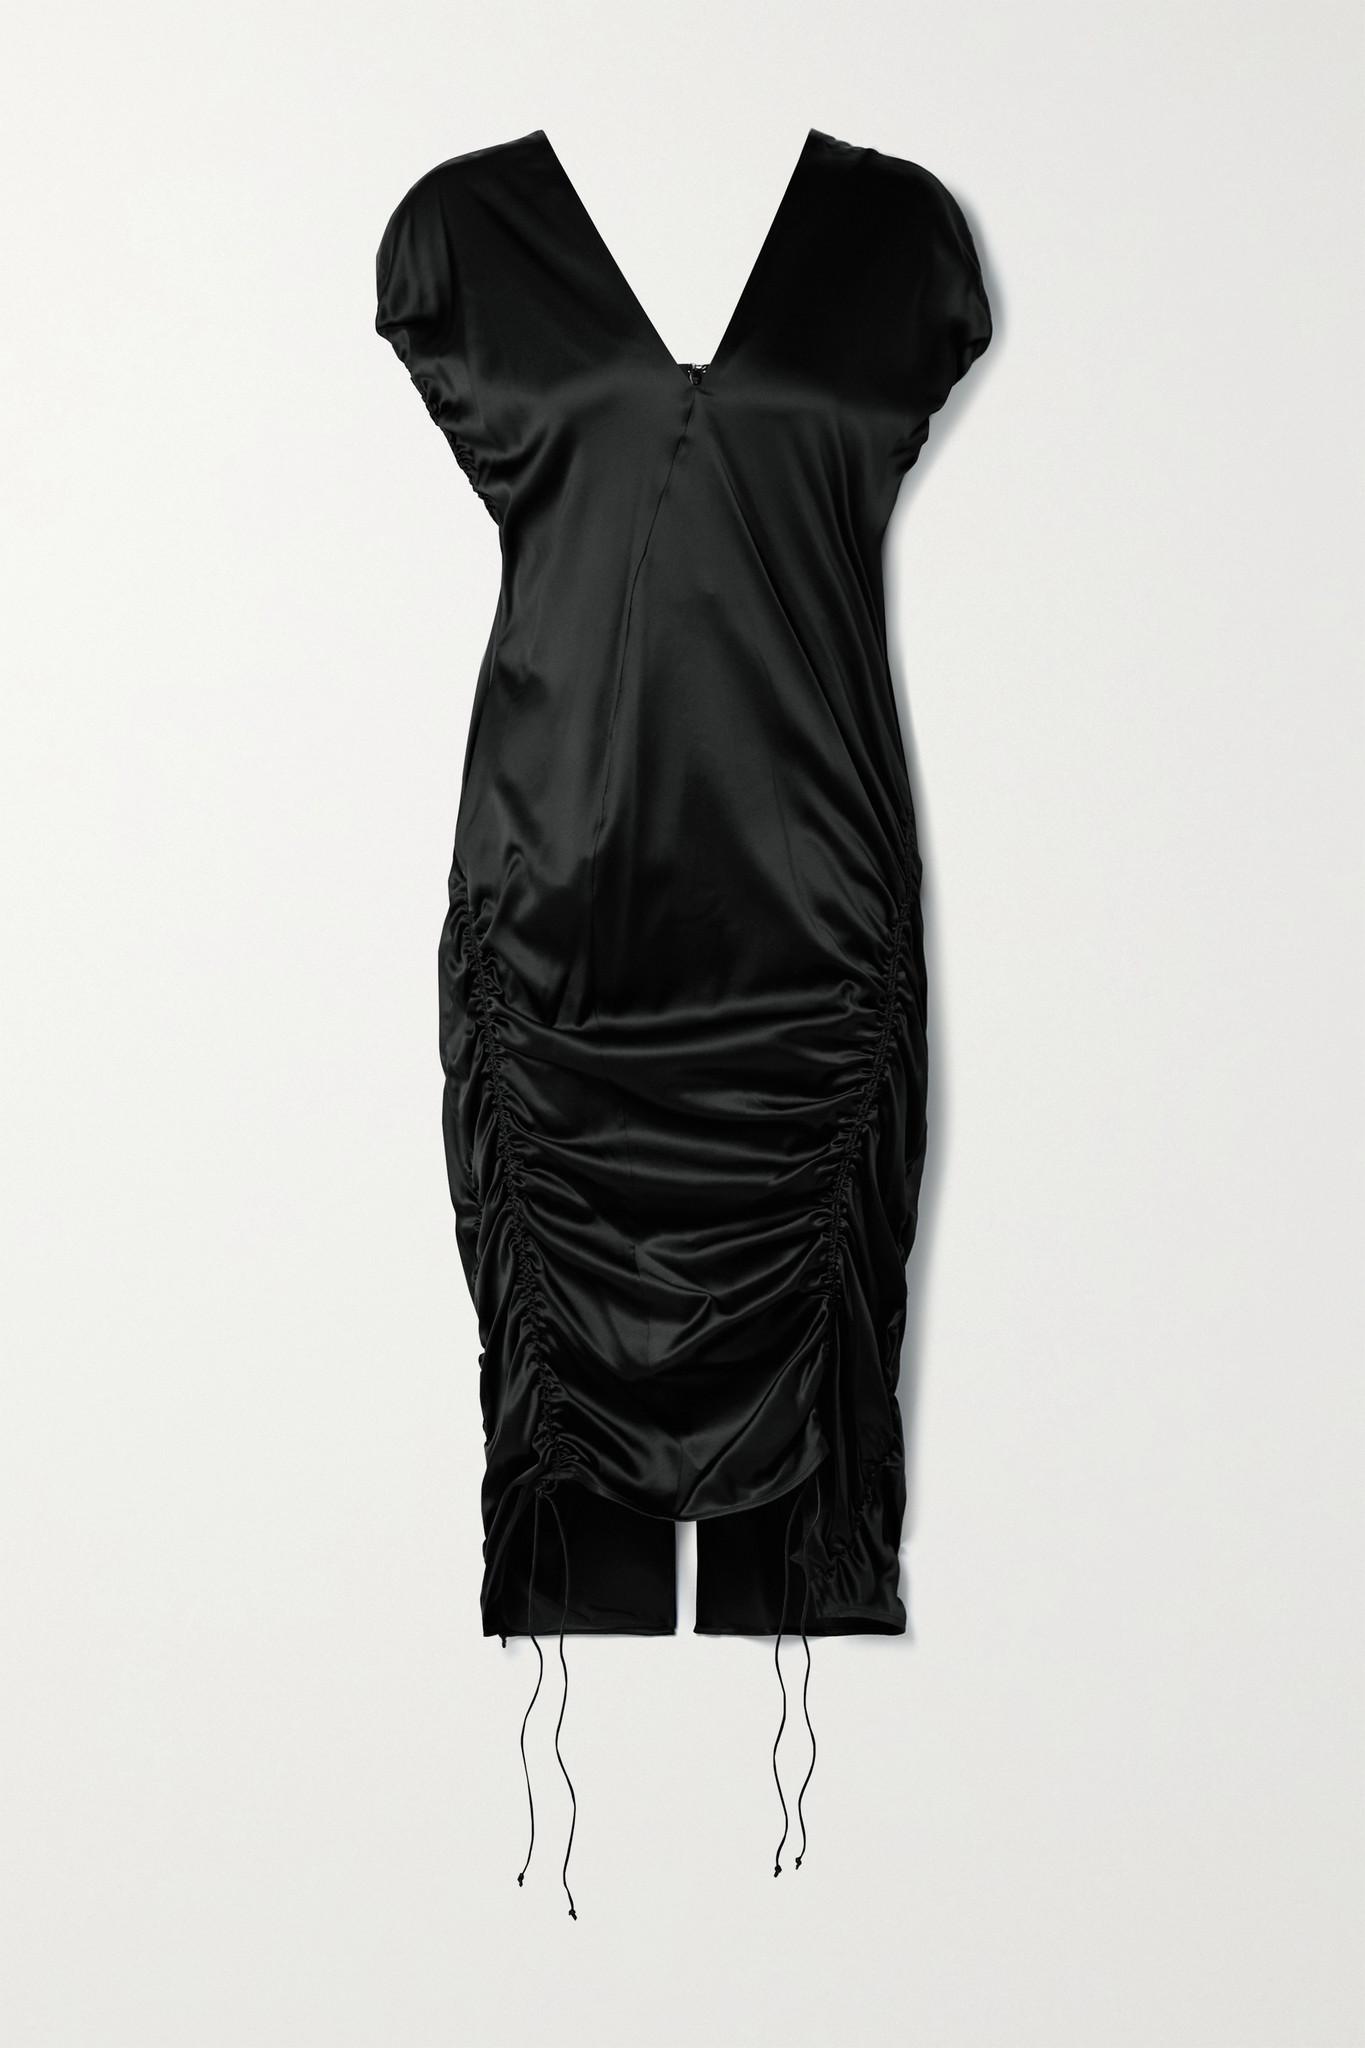 HELMUT LANG - 褶饰真丝混纺缎布中长连衣裙 - 黑色 - US8